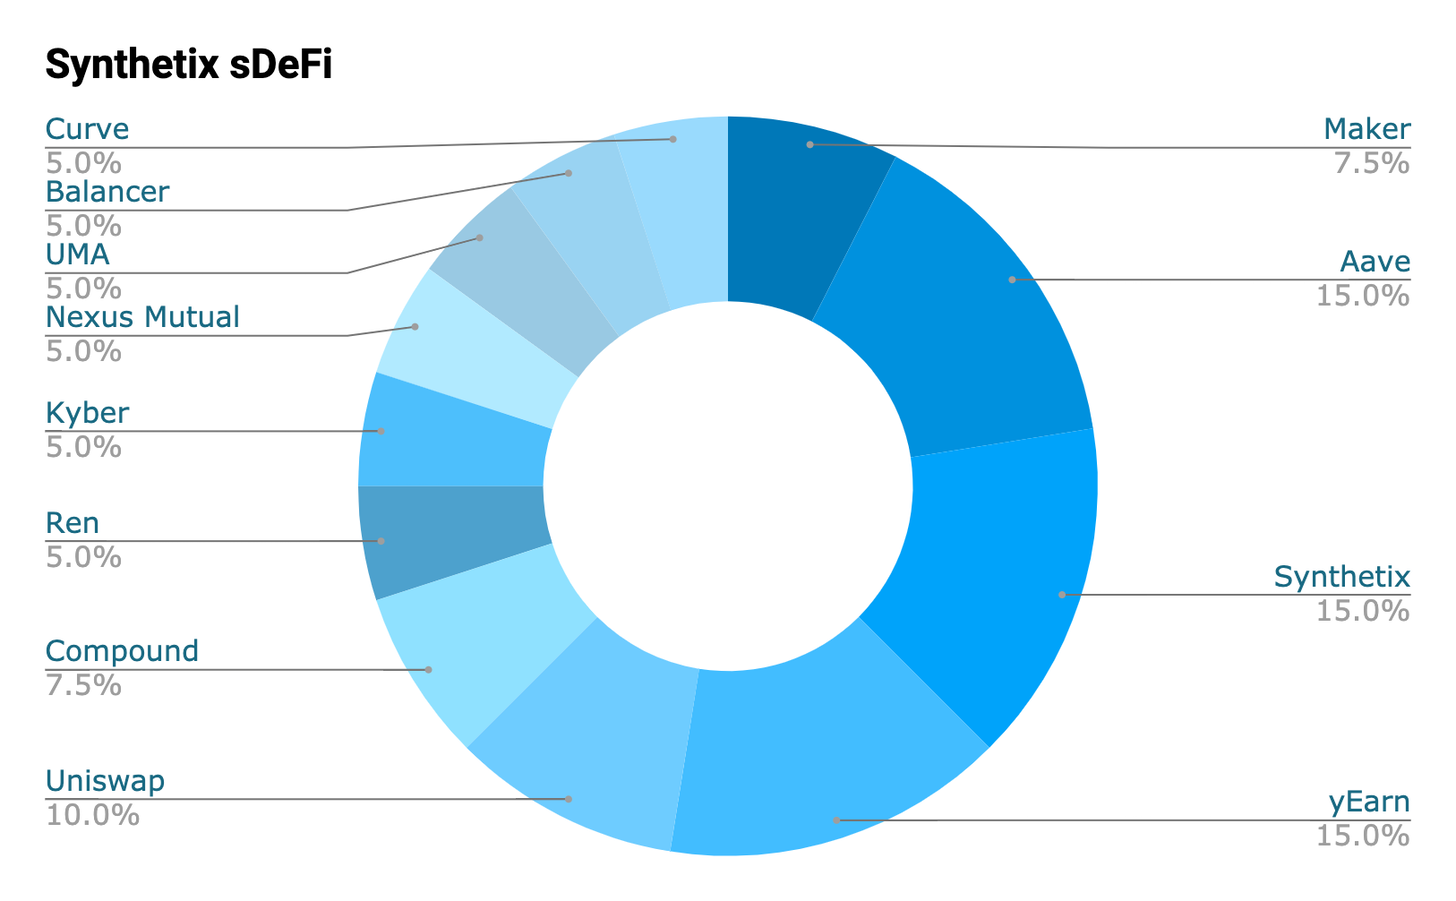 DeFi新玩法丨一文玩转最流行的DeFi指数,多样化投资DeFi资产